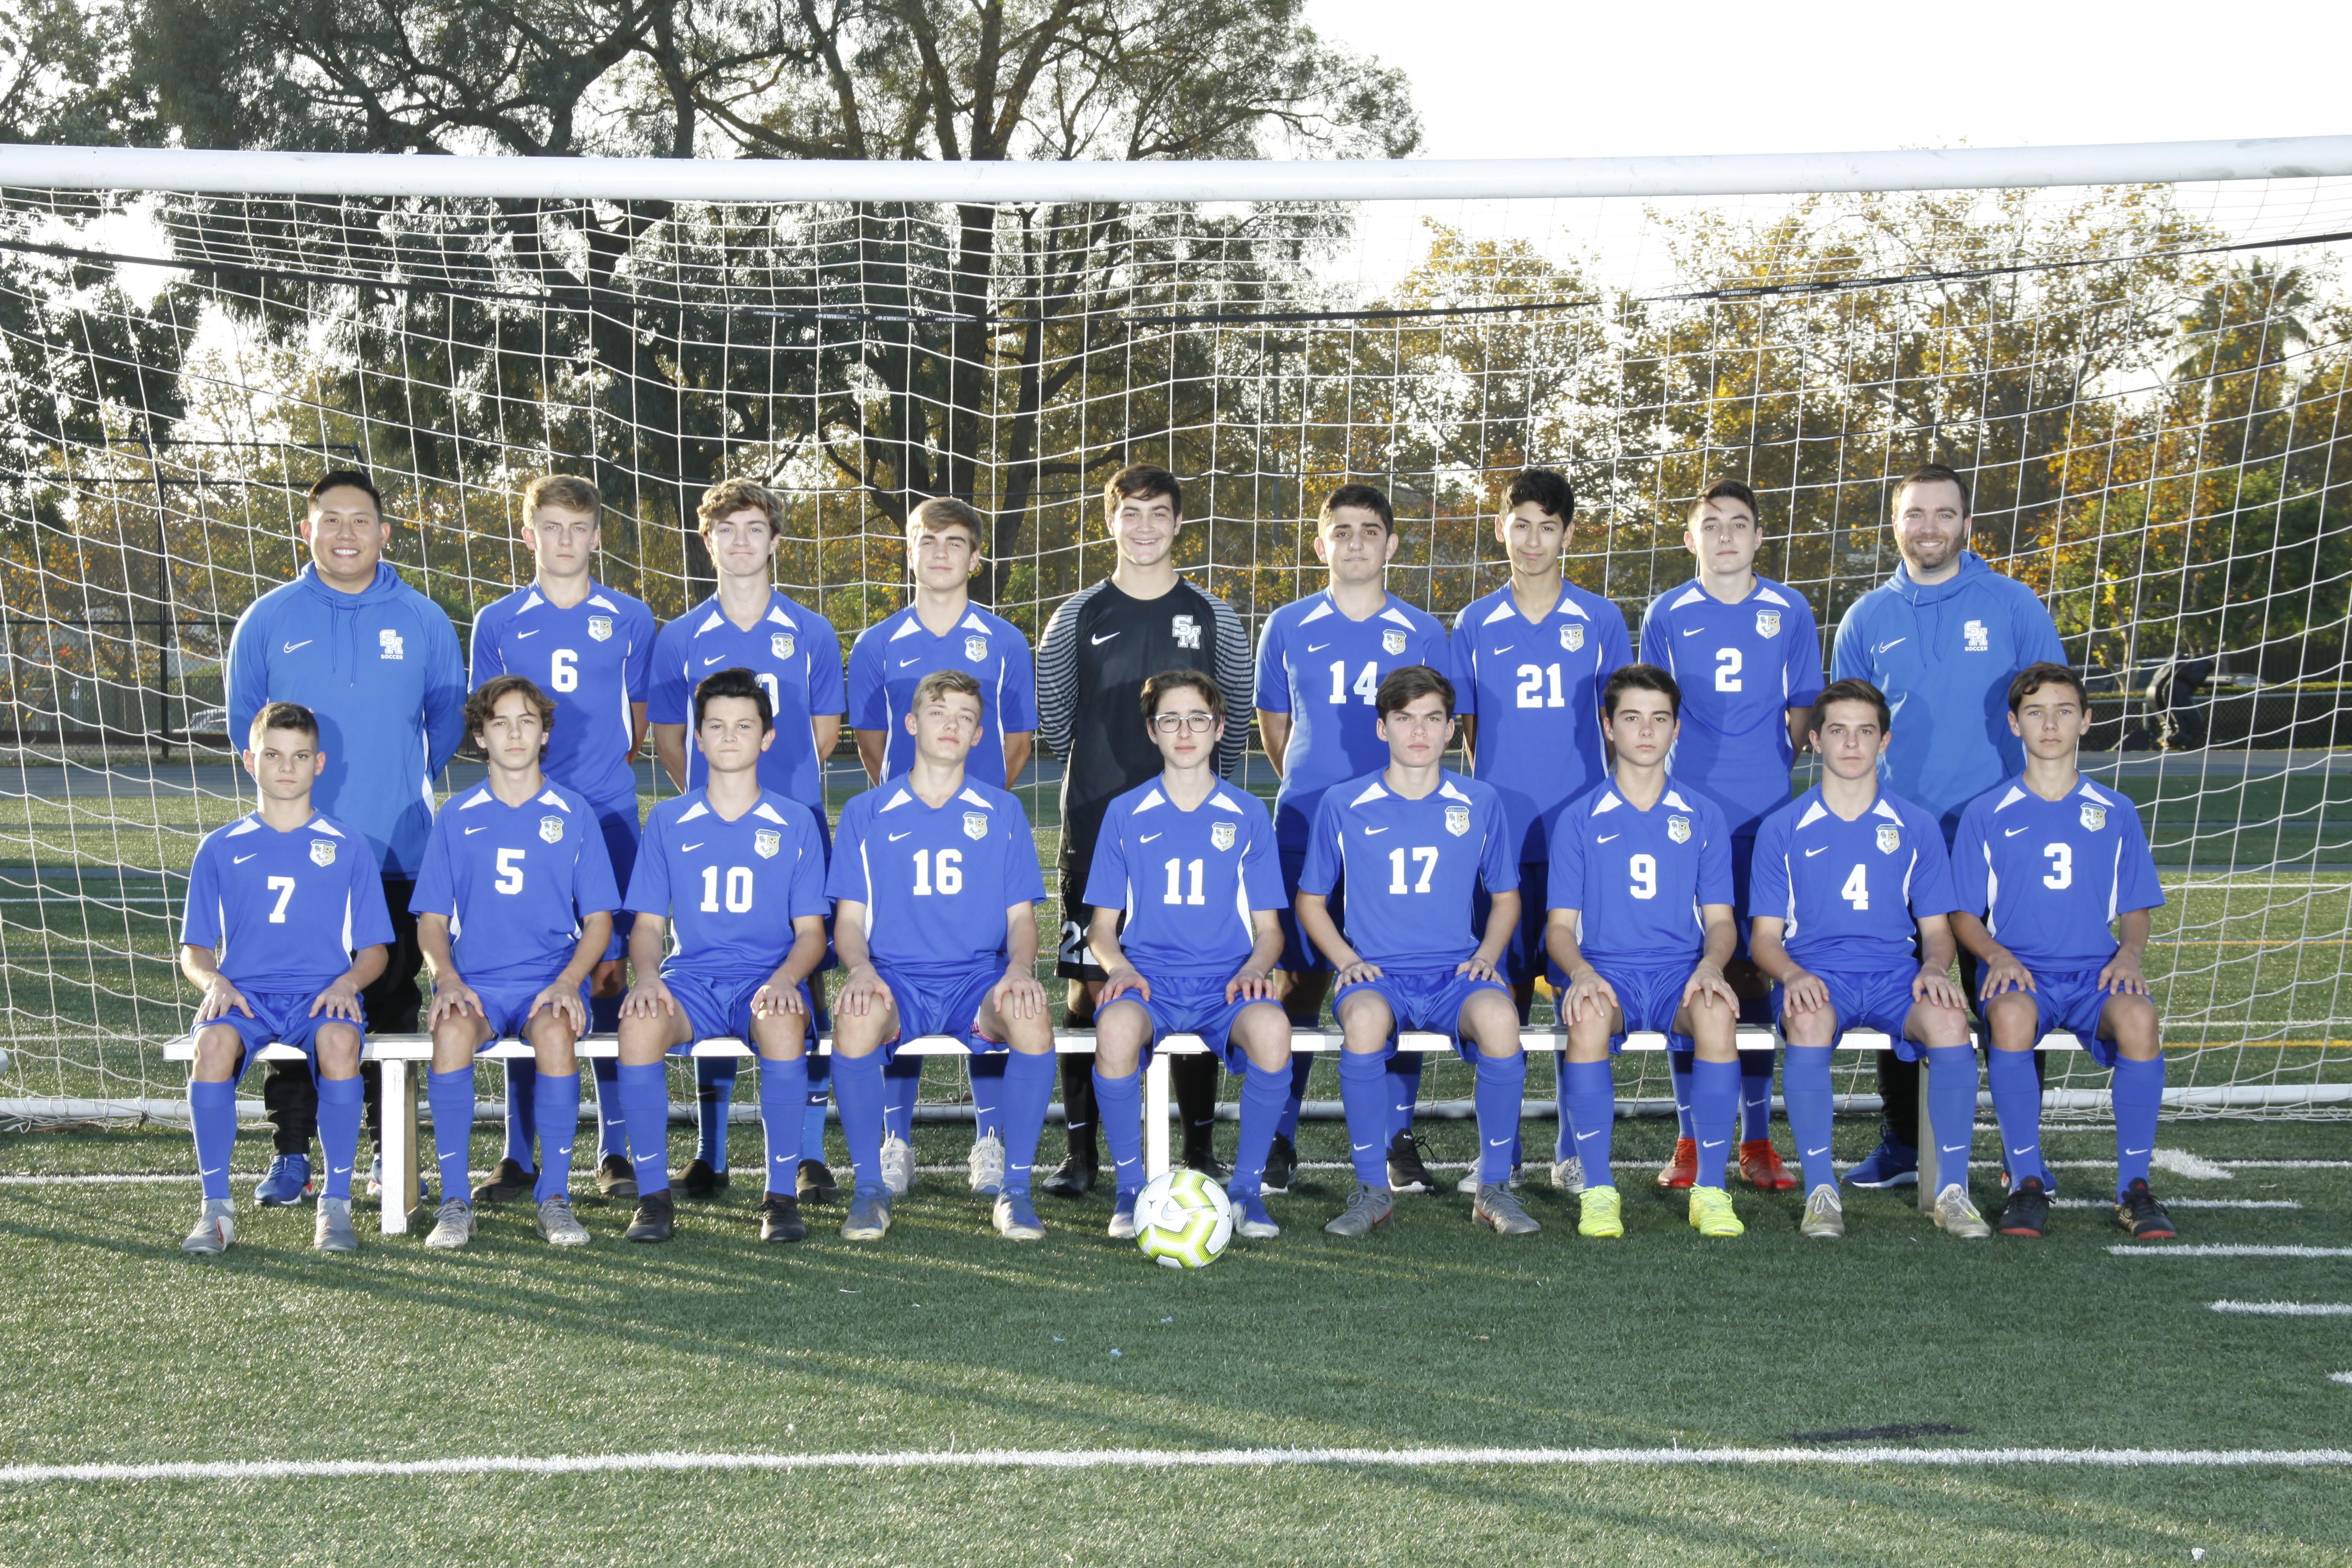 Boys Soccer - Santa Margarita Catholic High School